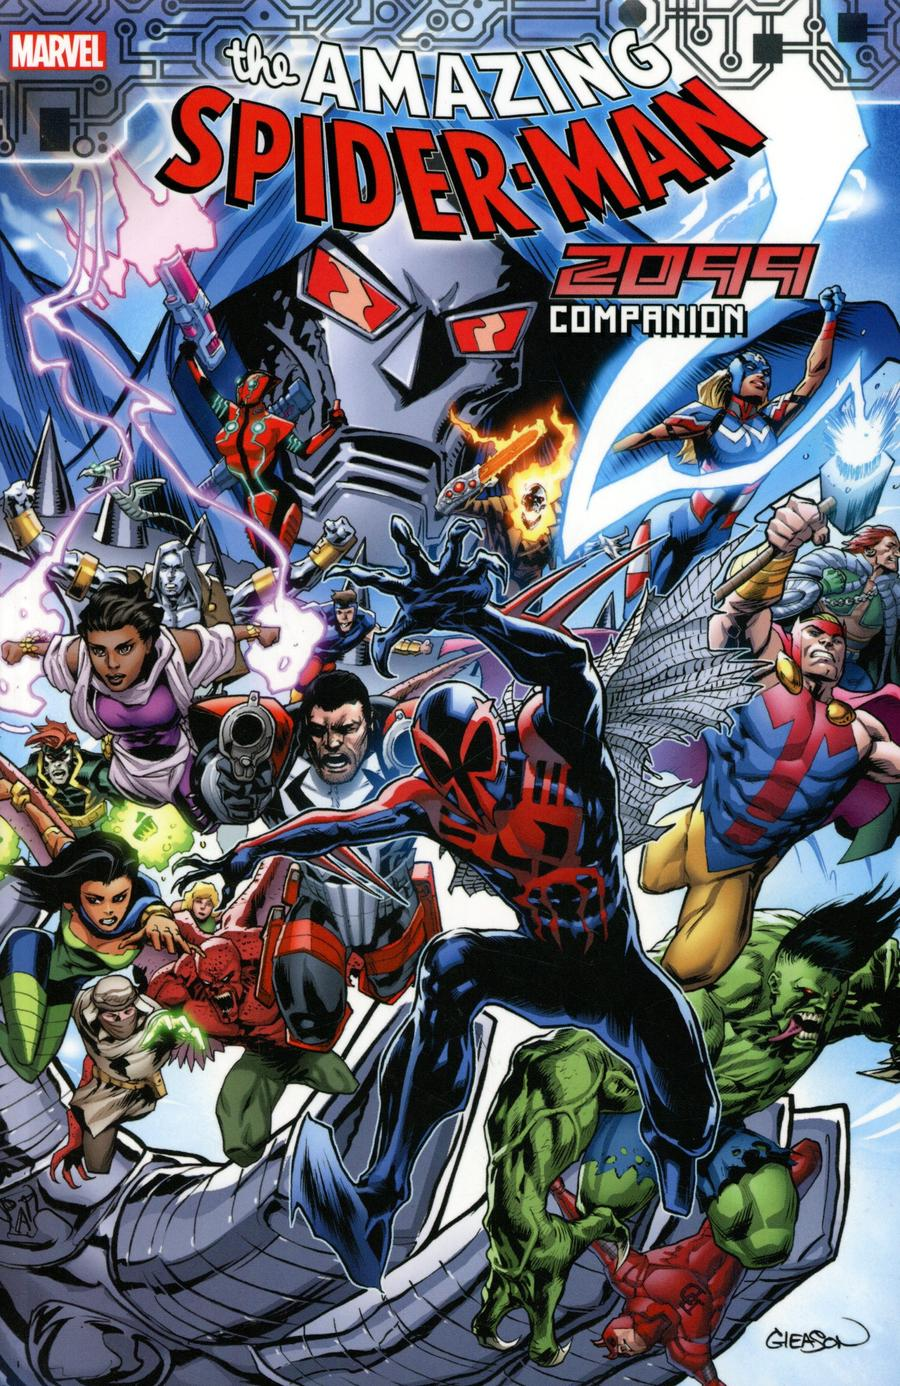 Amazing Spider-Man 2099 Companion TP